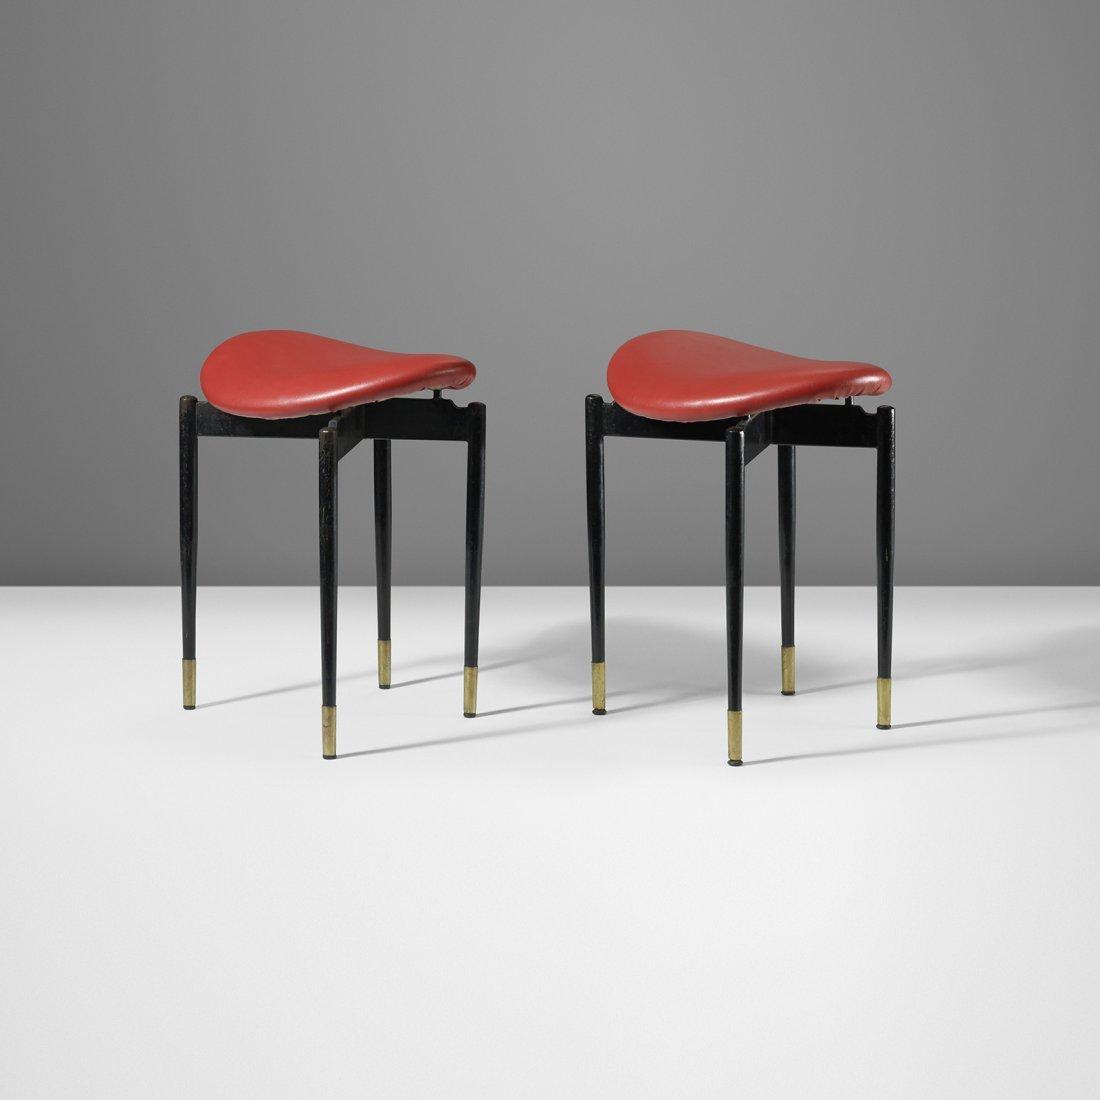 Carlo Mollino pair of stools from Lutrario Hall, Turin